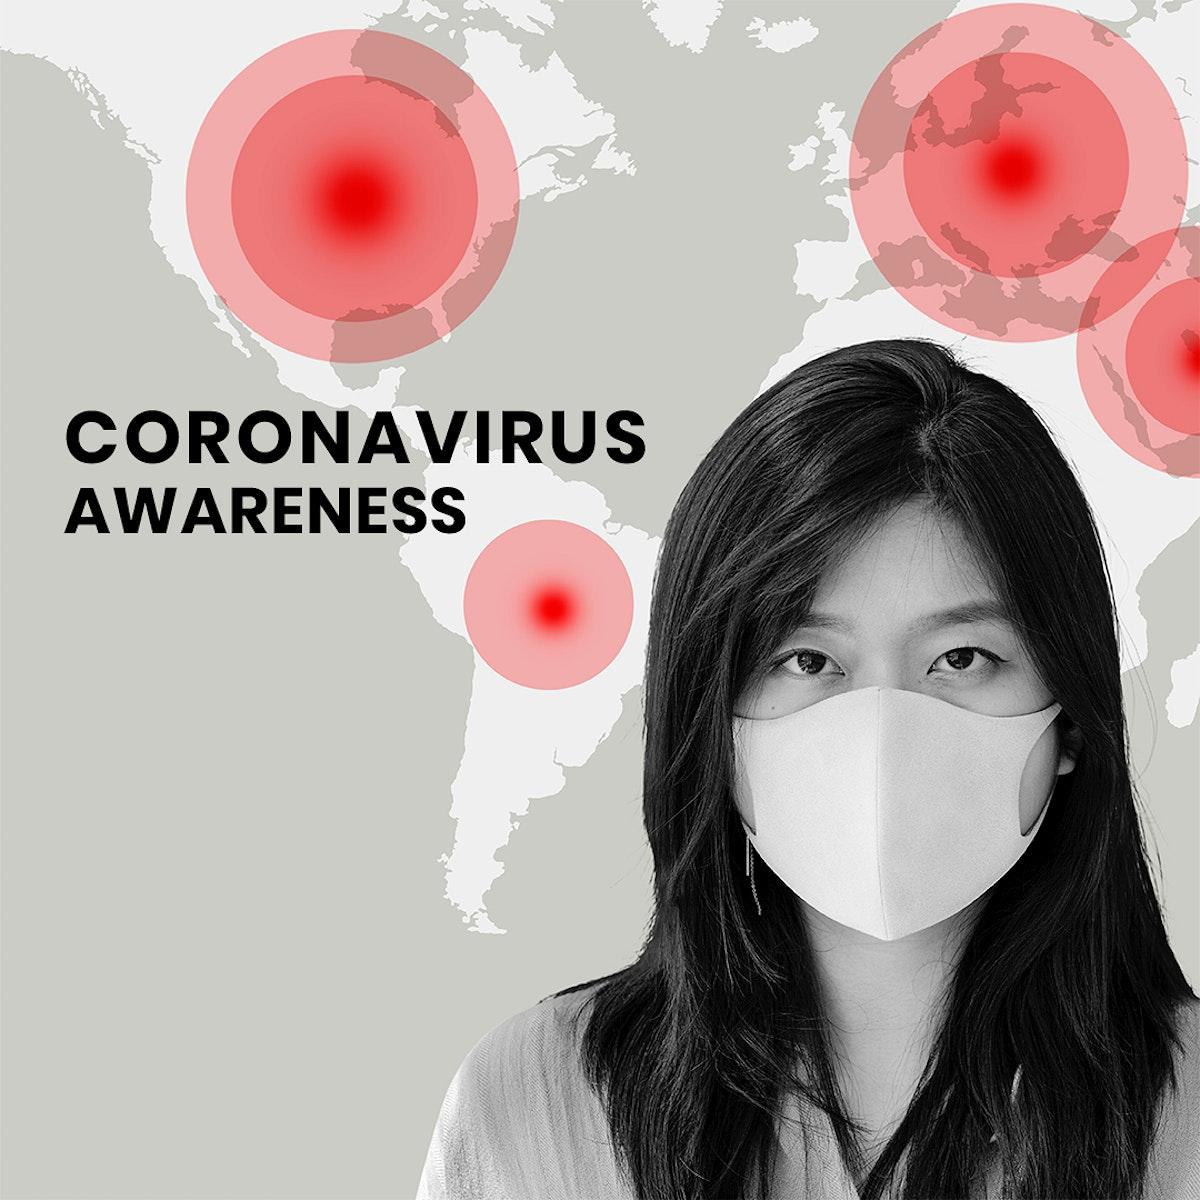 Coronavirus awareness social template mockup